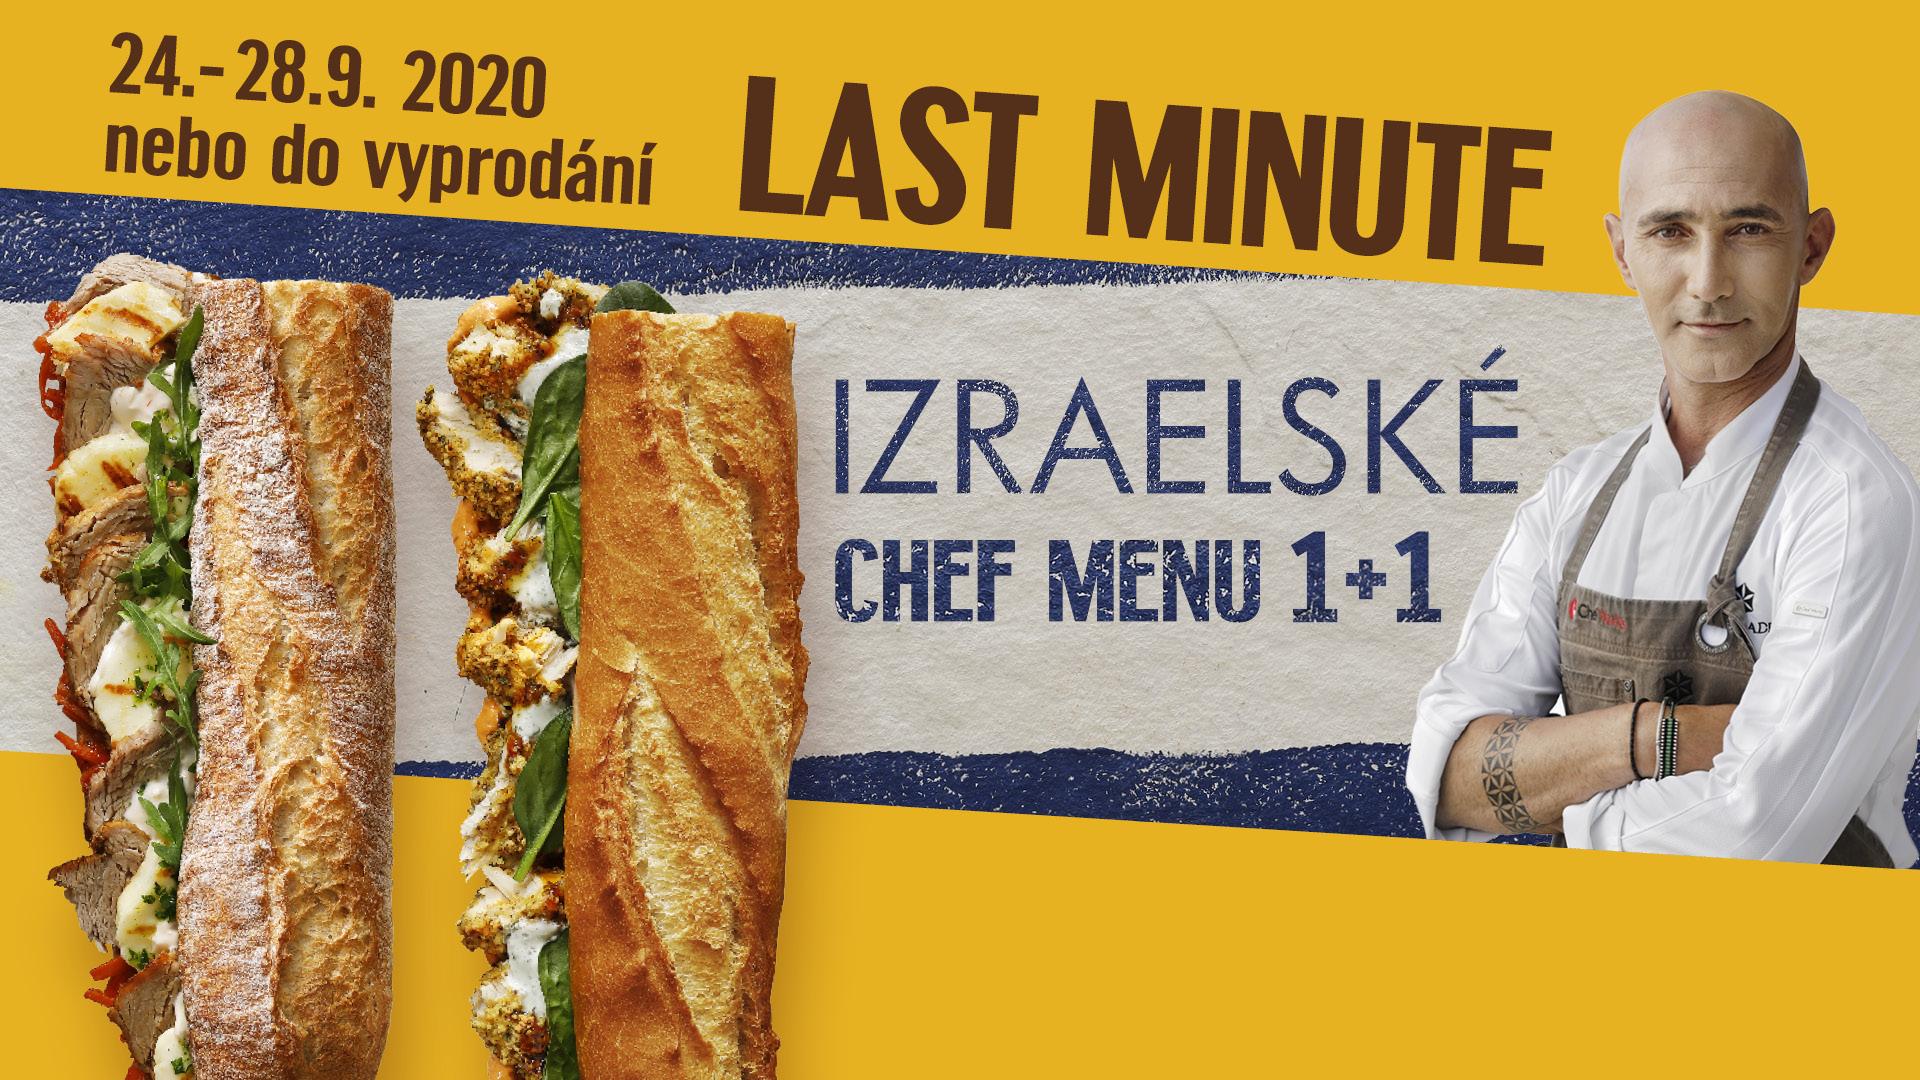 Last minute Izraelské Chef menu 1+1